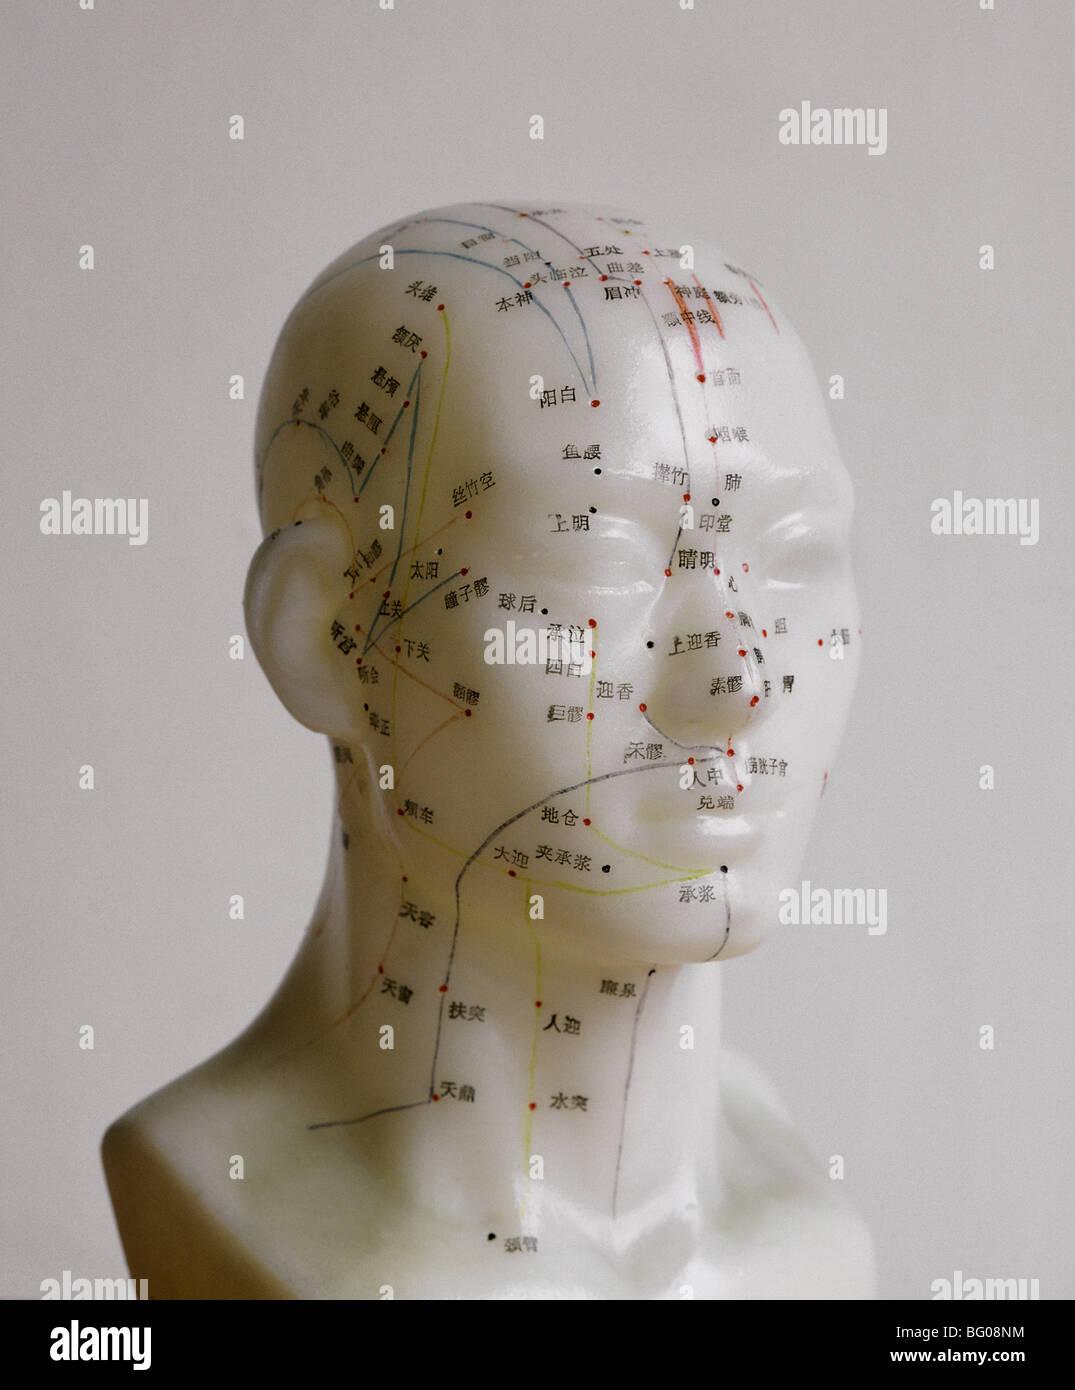 Akupunkturpunkte, chinesische Medizin Stockbild